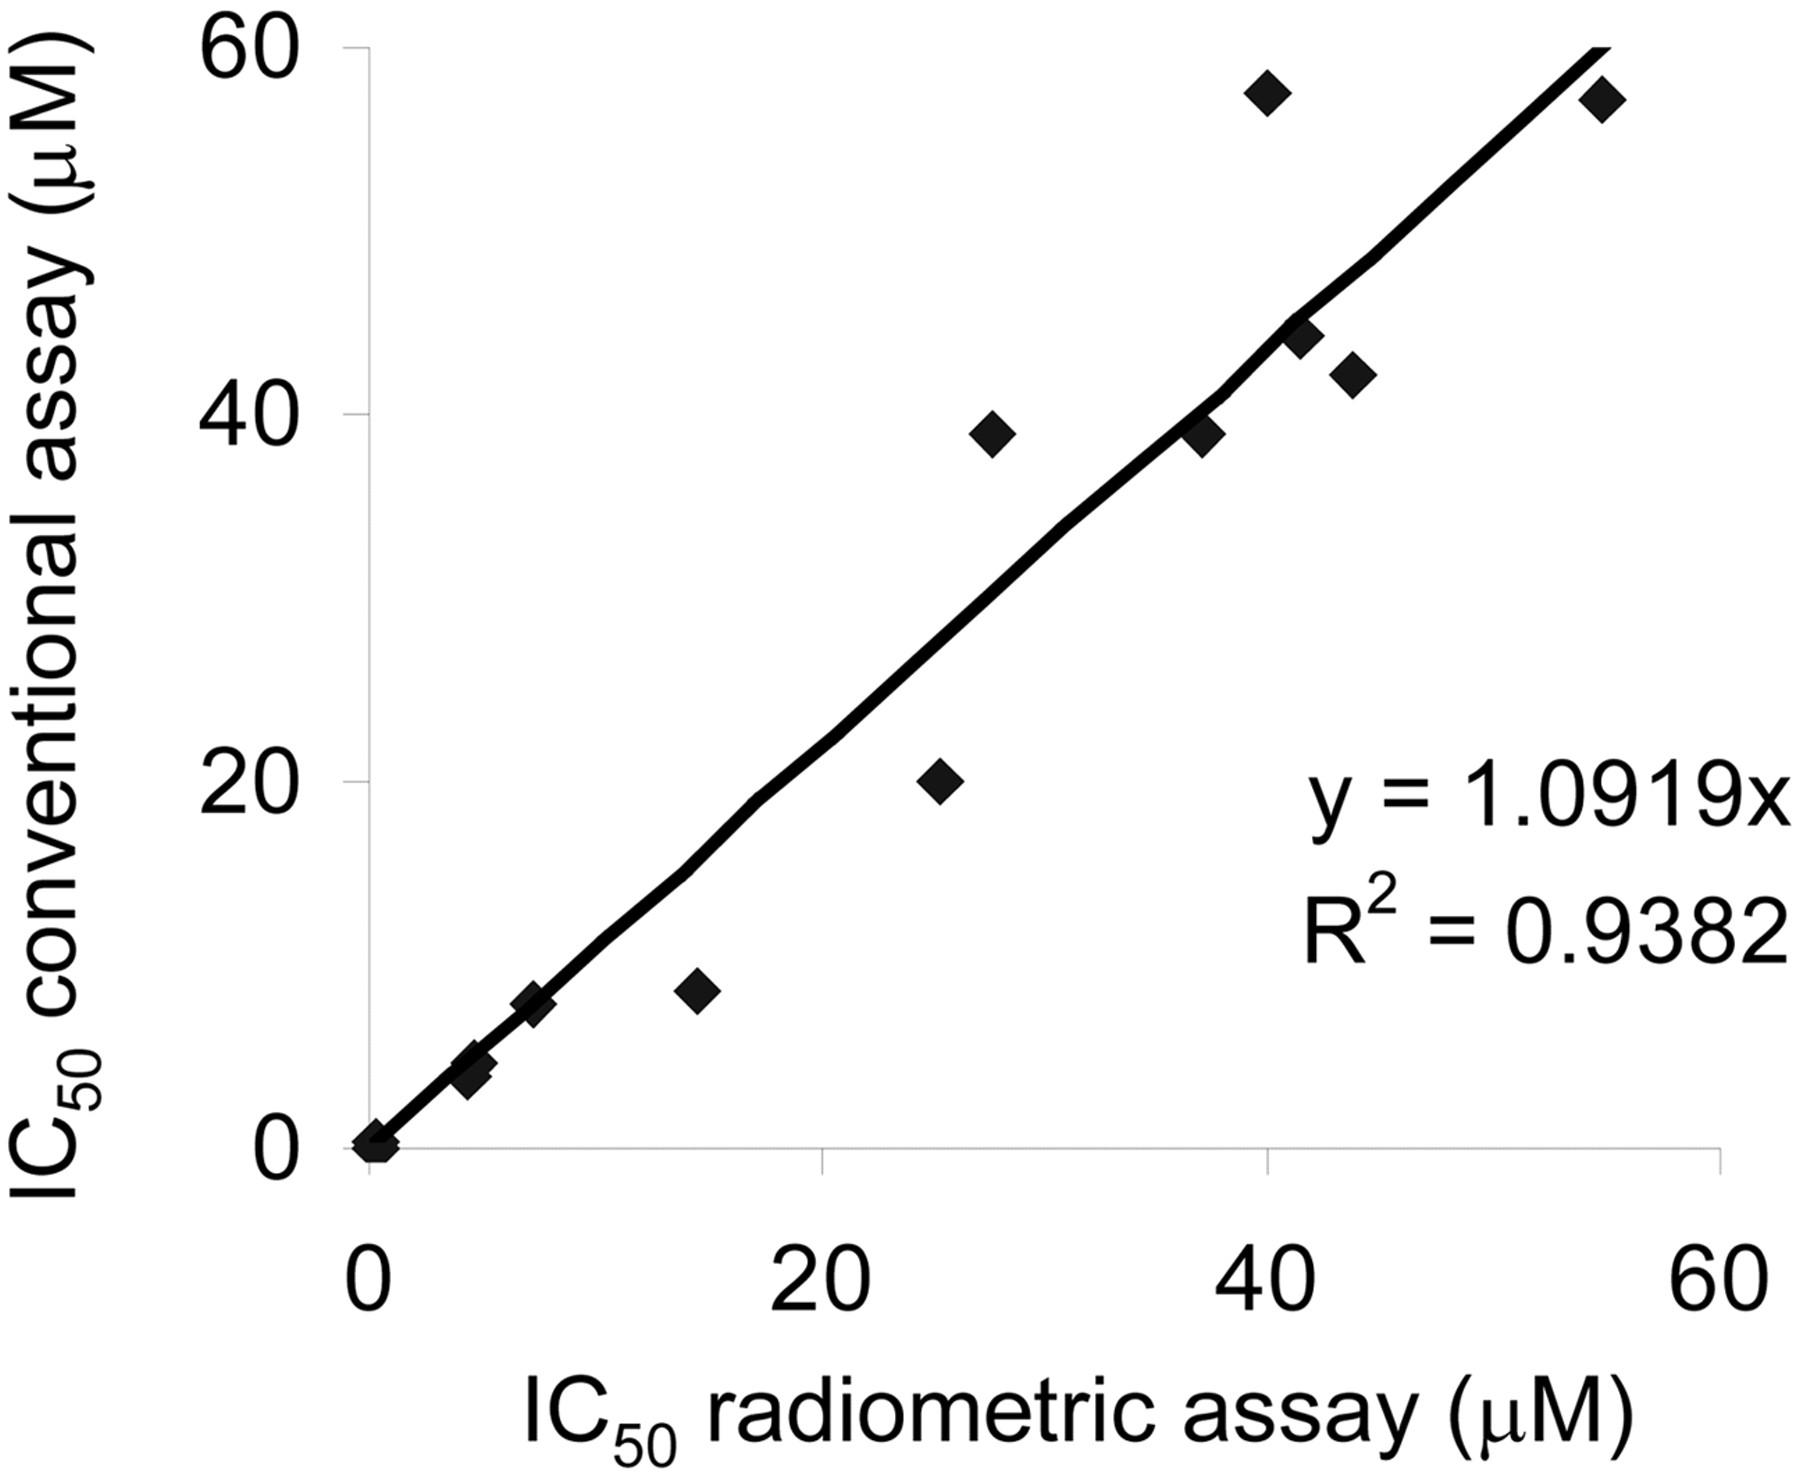 DEVELOPMENT AND VALIDATION OF A HIGH-THROUGHPUT RADIOMETRIC CYP2C9